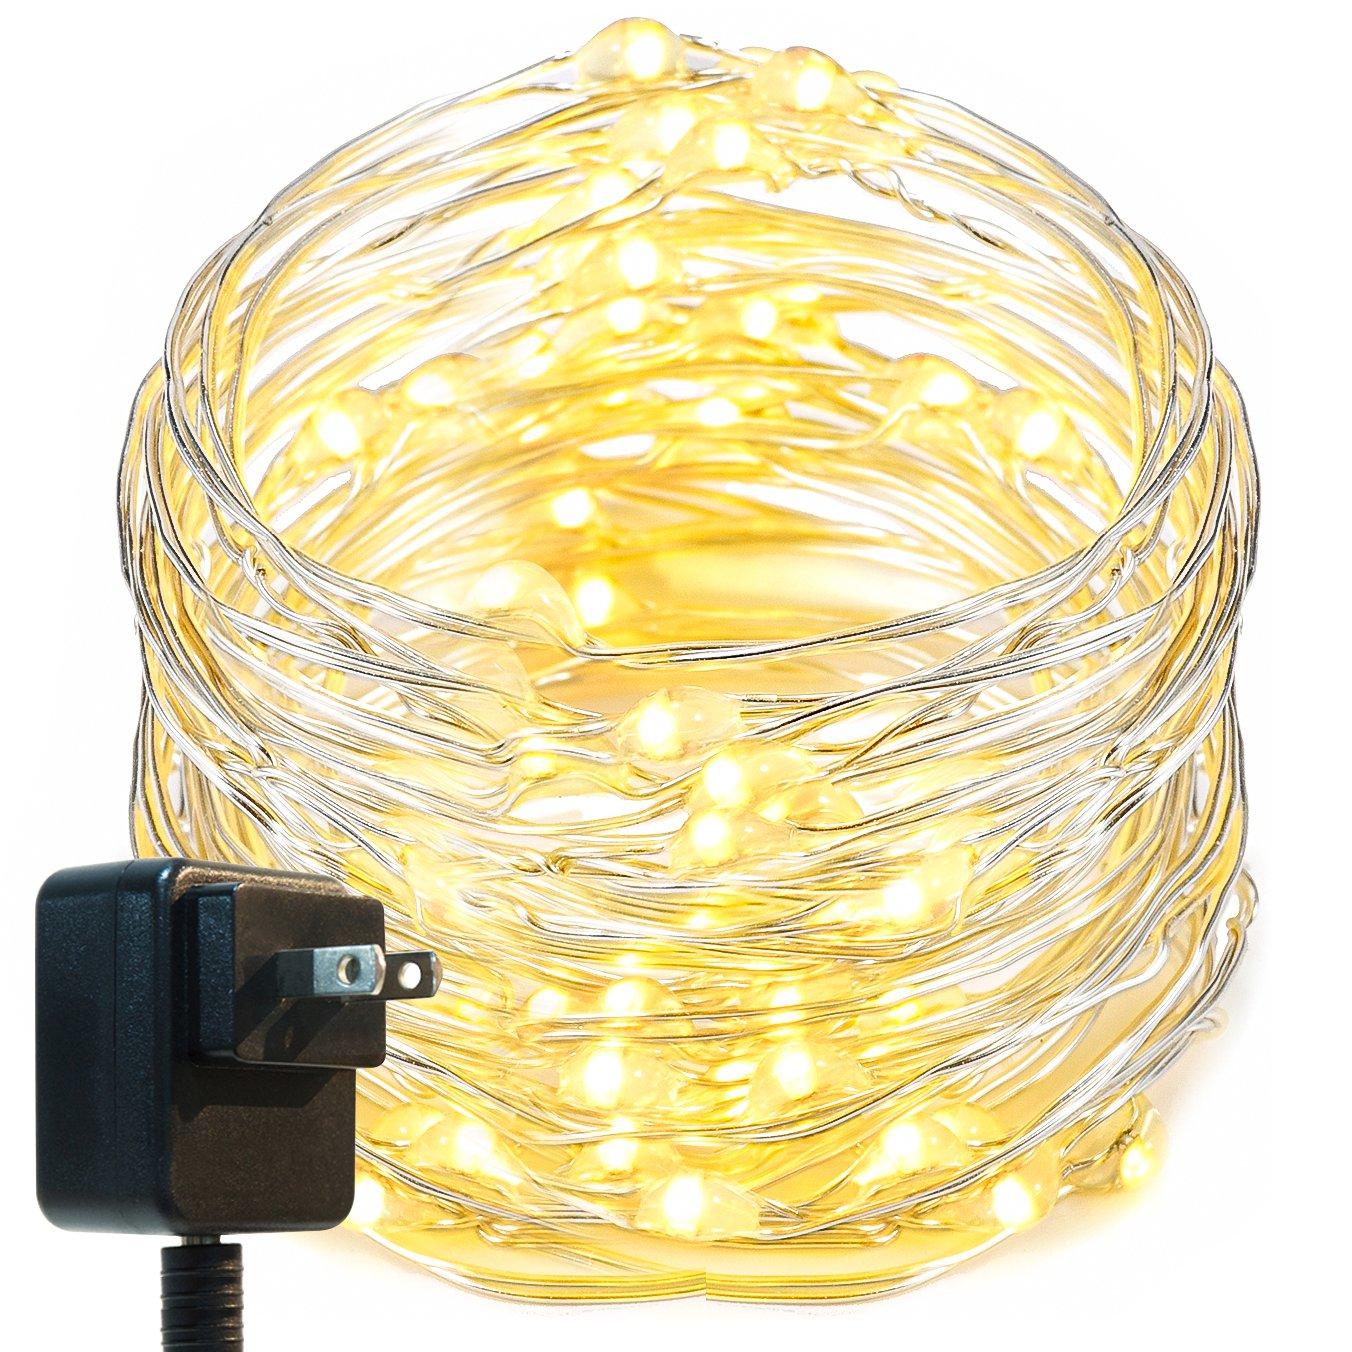 Oak Leaf LED String Lights,33 ft 100 LEDs Starry Fairy Lights for Bedroom,Wedding,Patio,Gate,Party, 3V Power Adapter,Warm White